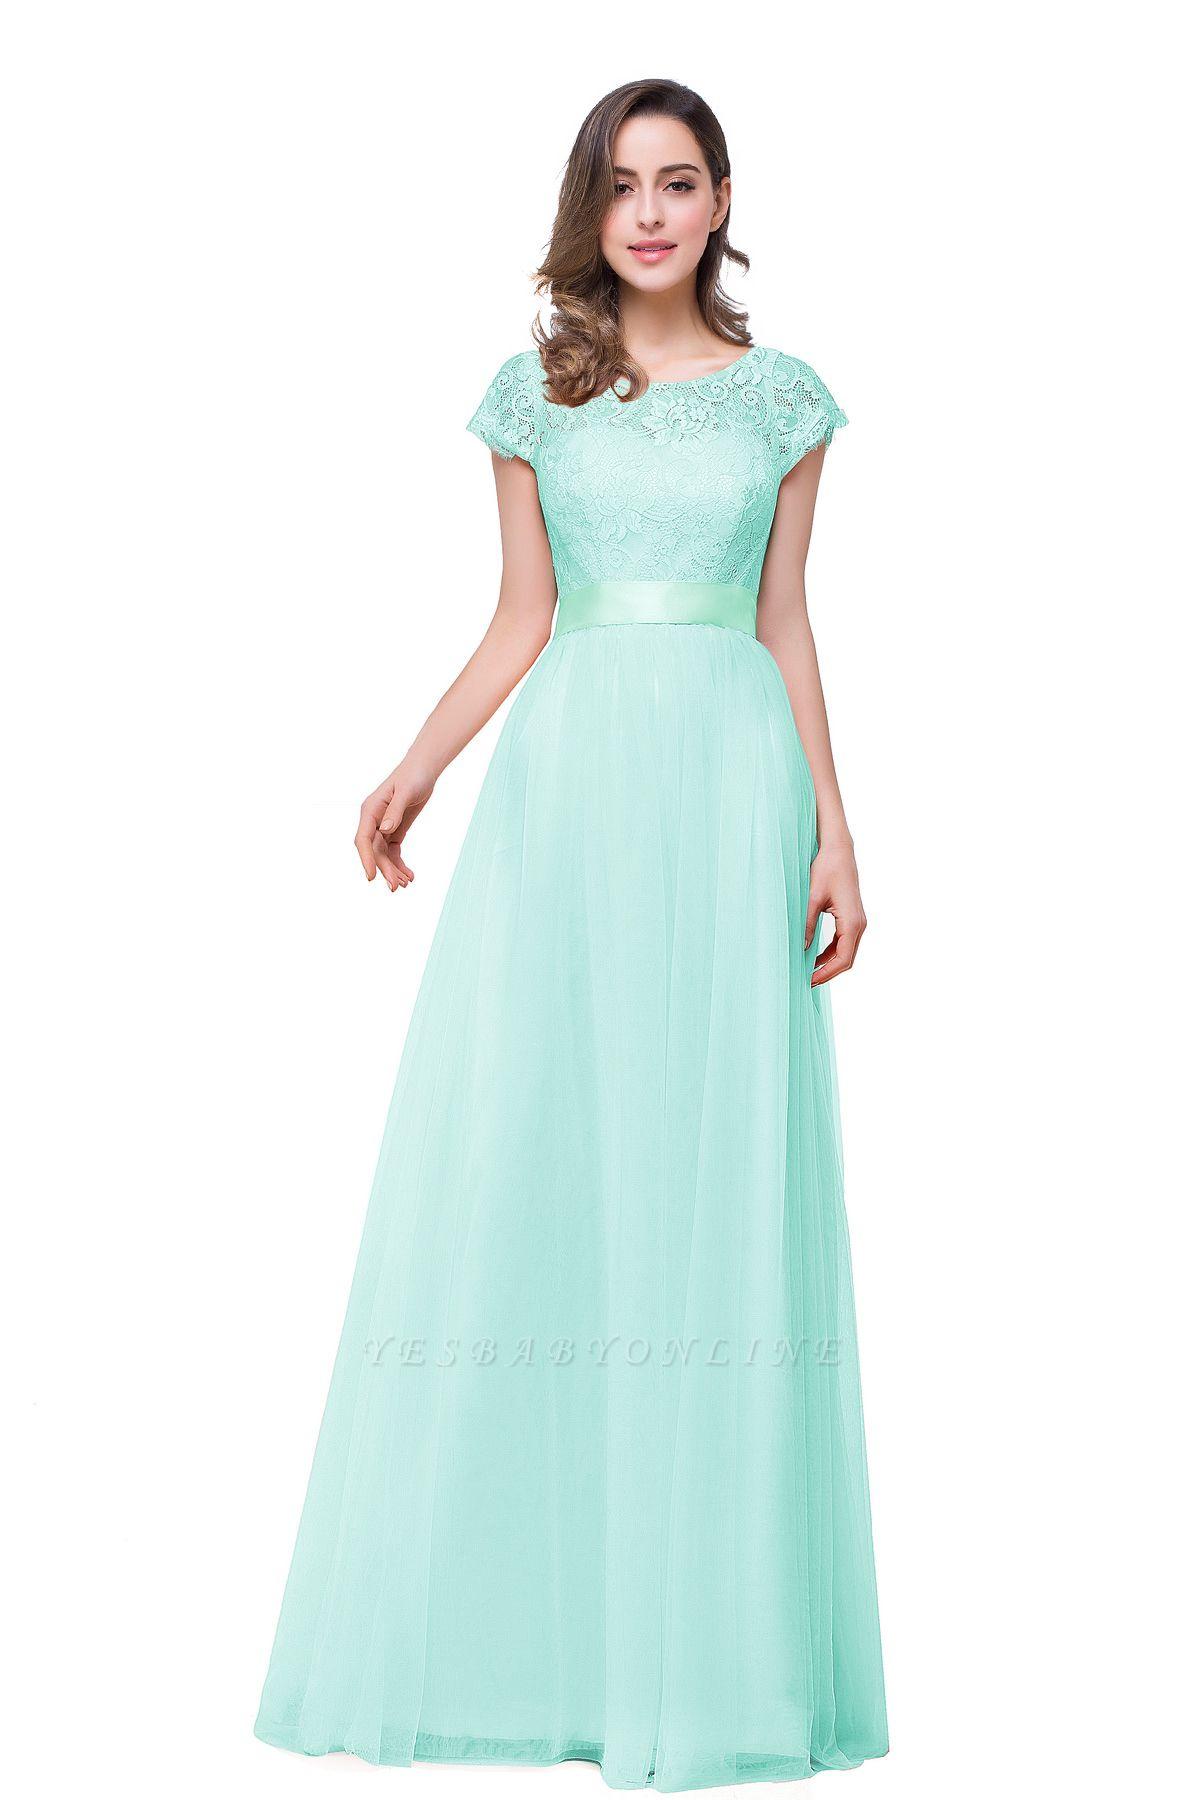 ELLIANA | Elegant Short Sleeves A-line Chiffon Bridesmaid Dresses with Ribbon Bow Sash